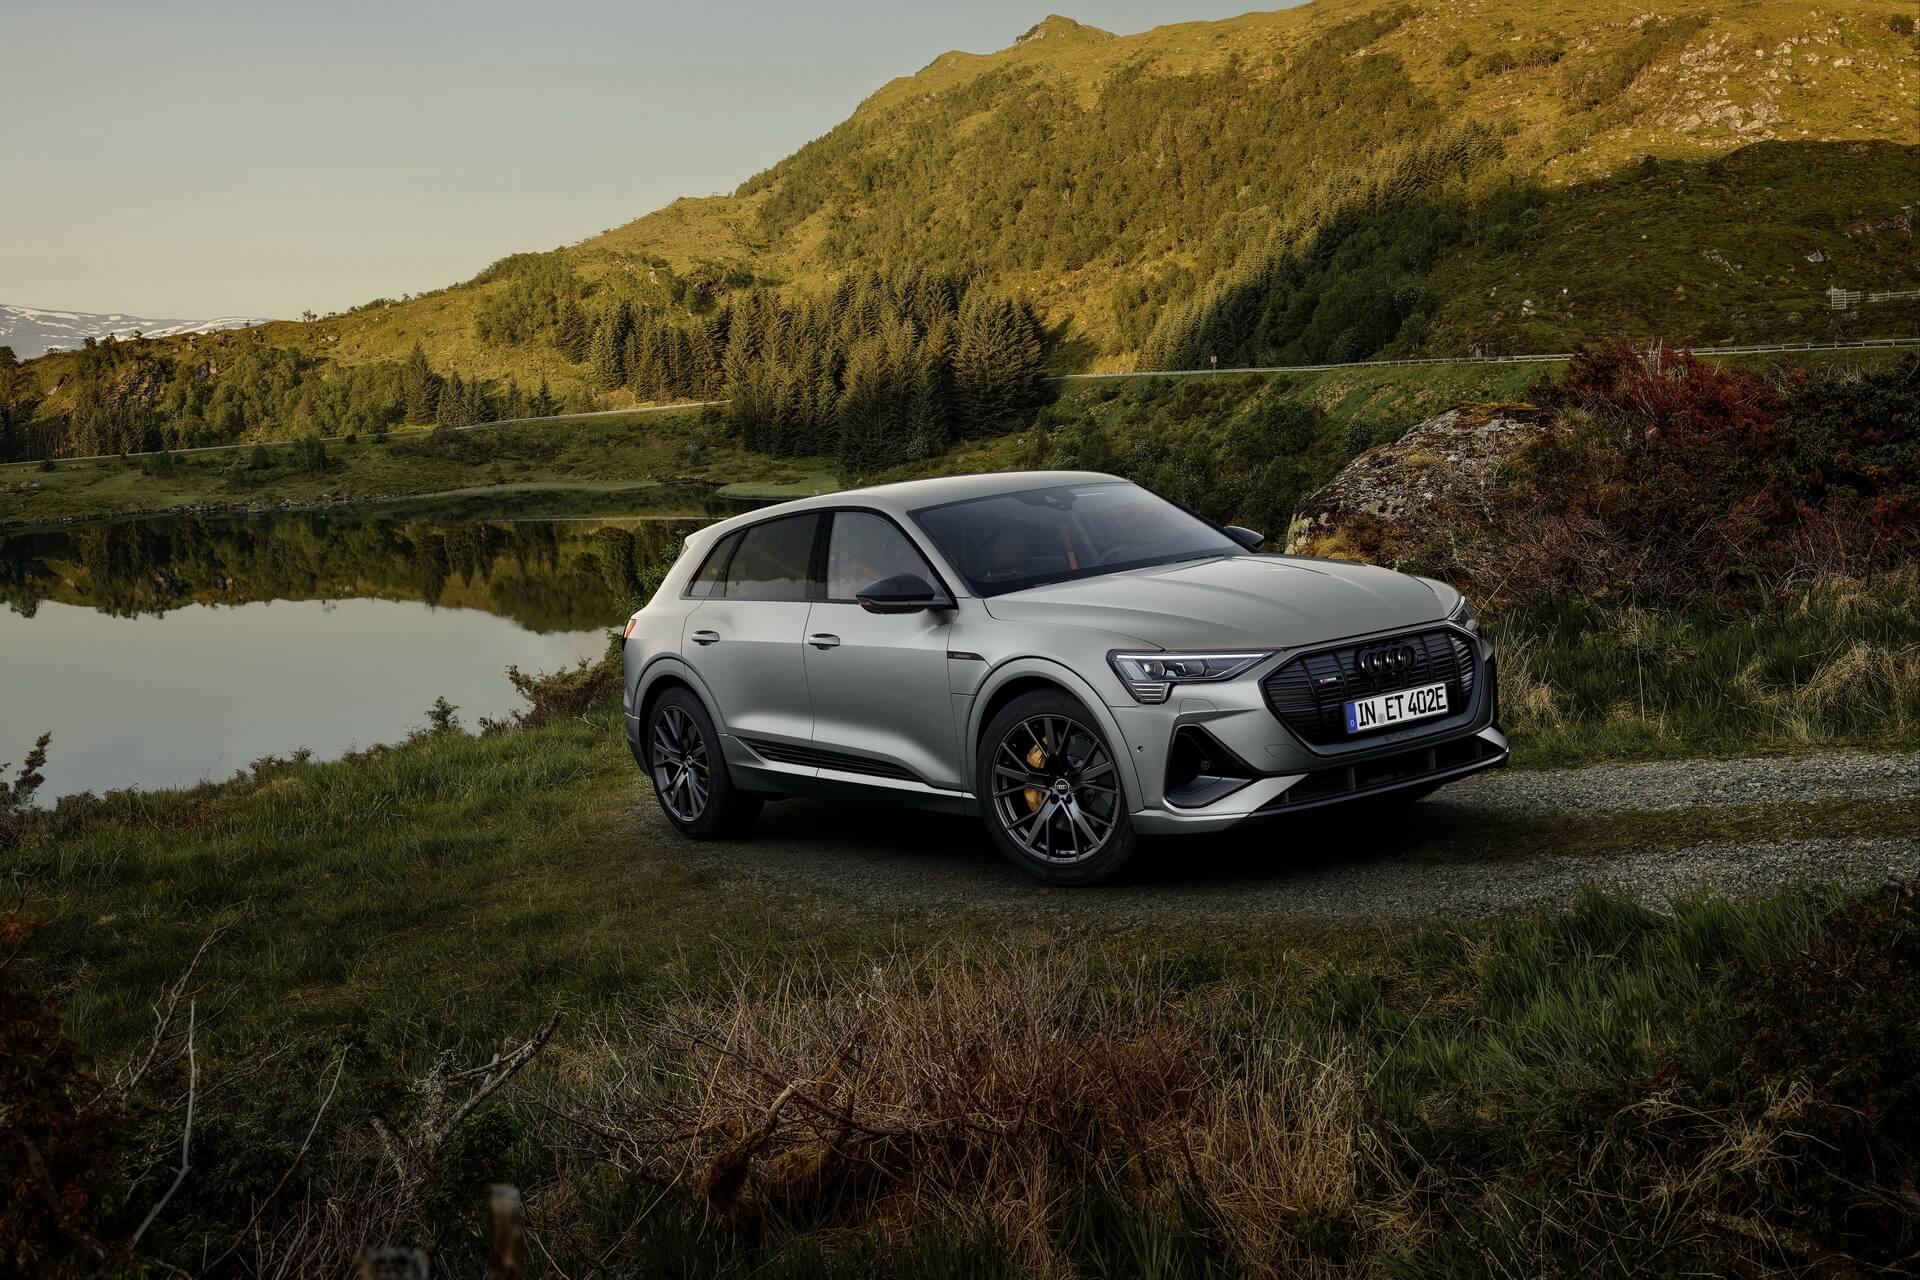 Audi e-tron quattro иe-tron Sportback доступны висполненииS line black edition